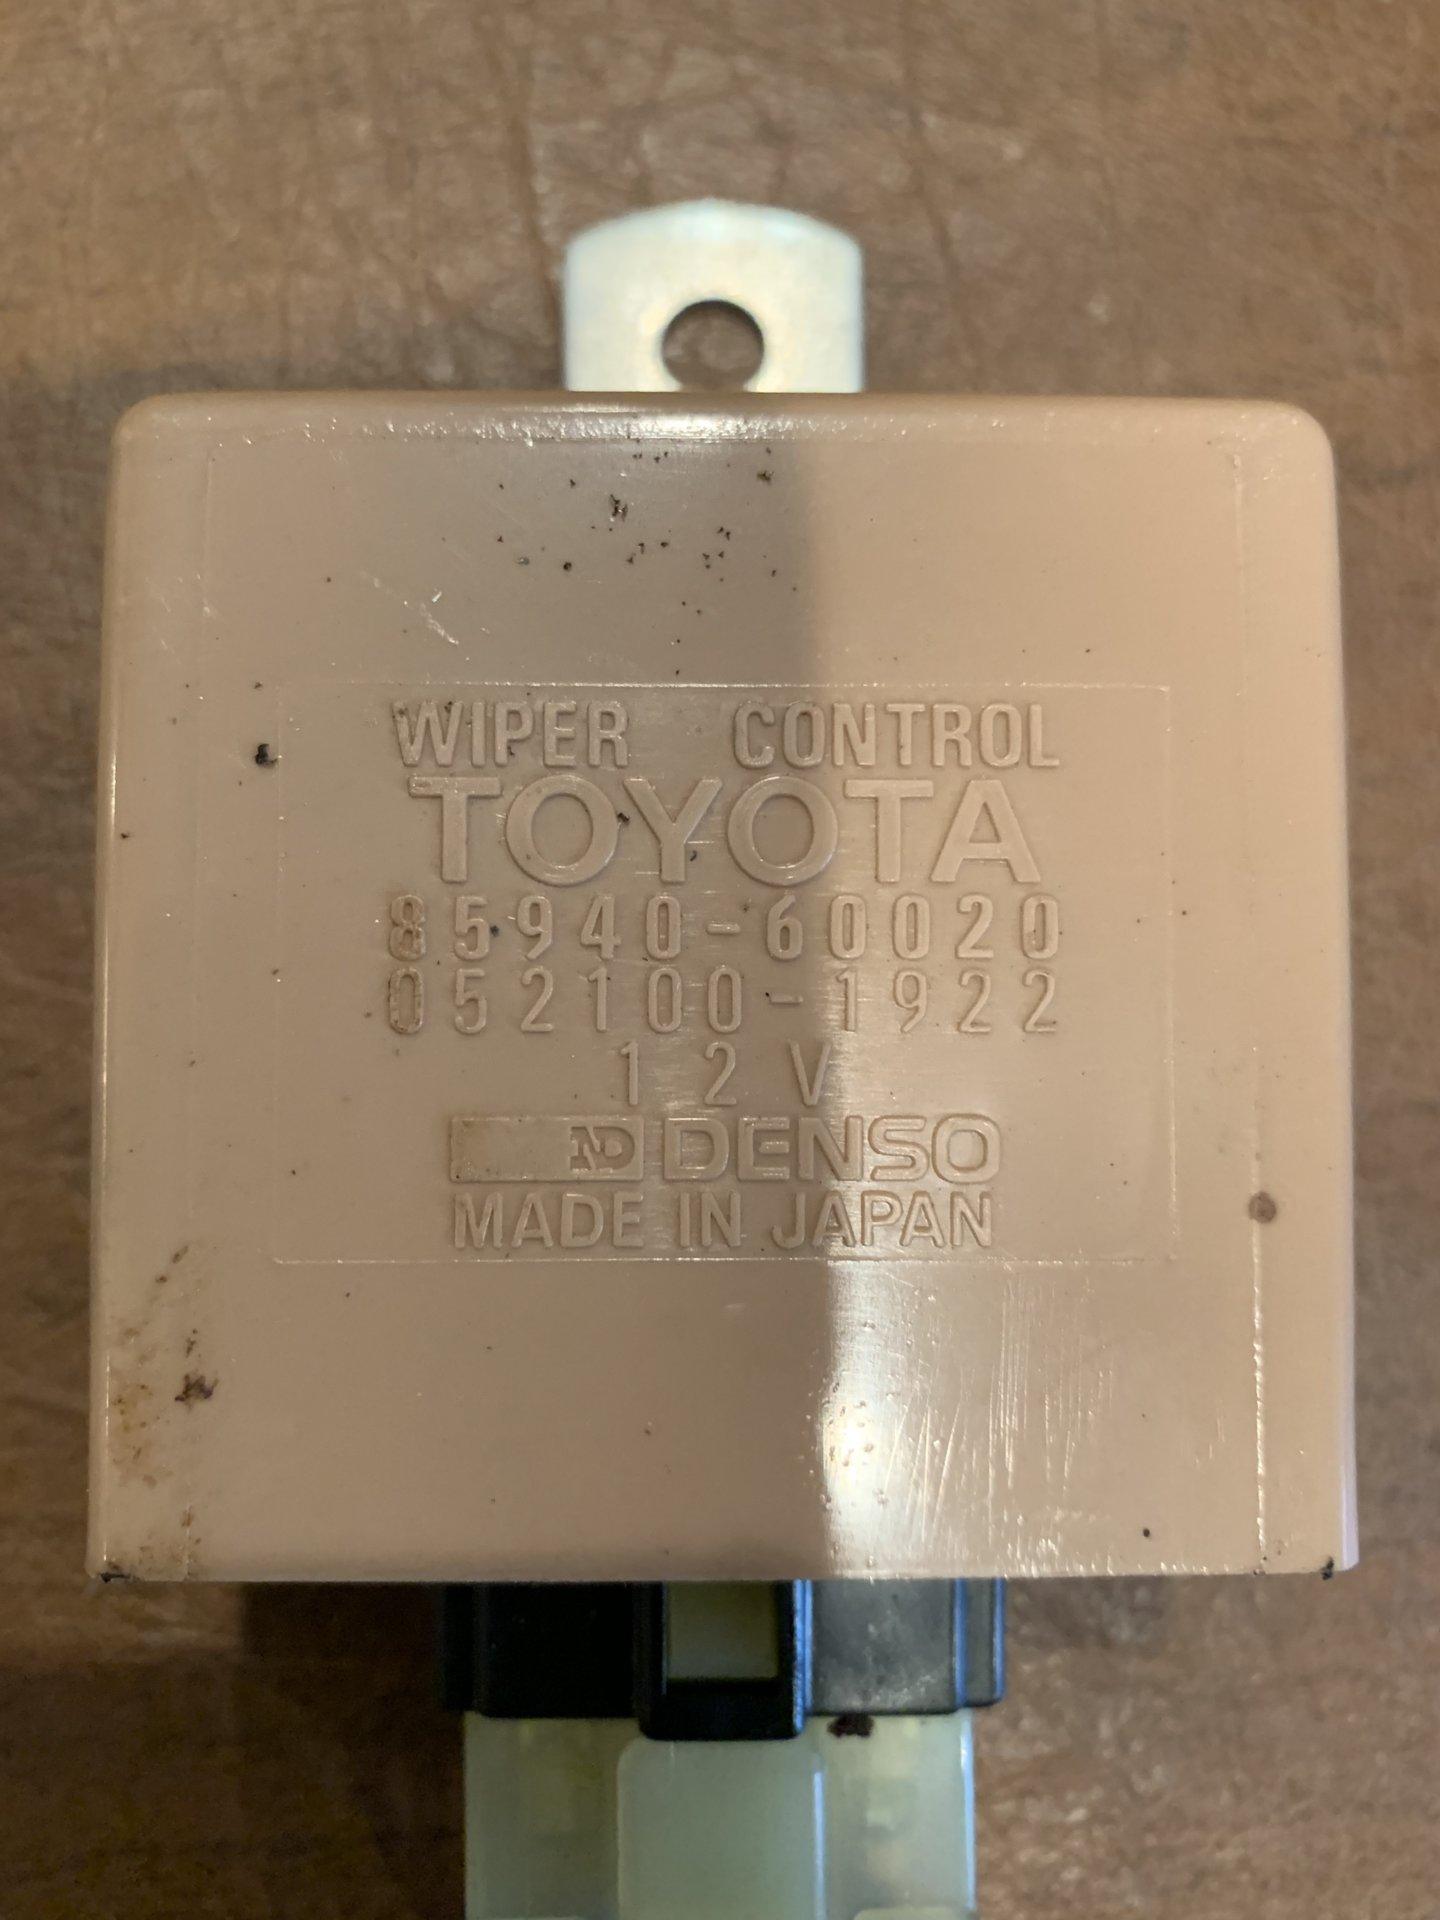 BB14BAE1-5859-4D2C-94AE-DD7E405C4CAB.jpeg